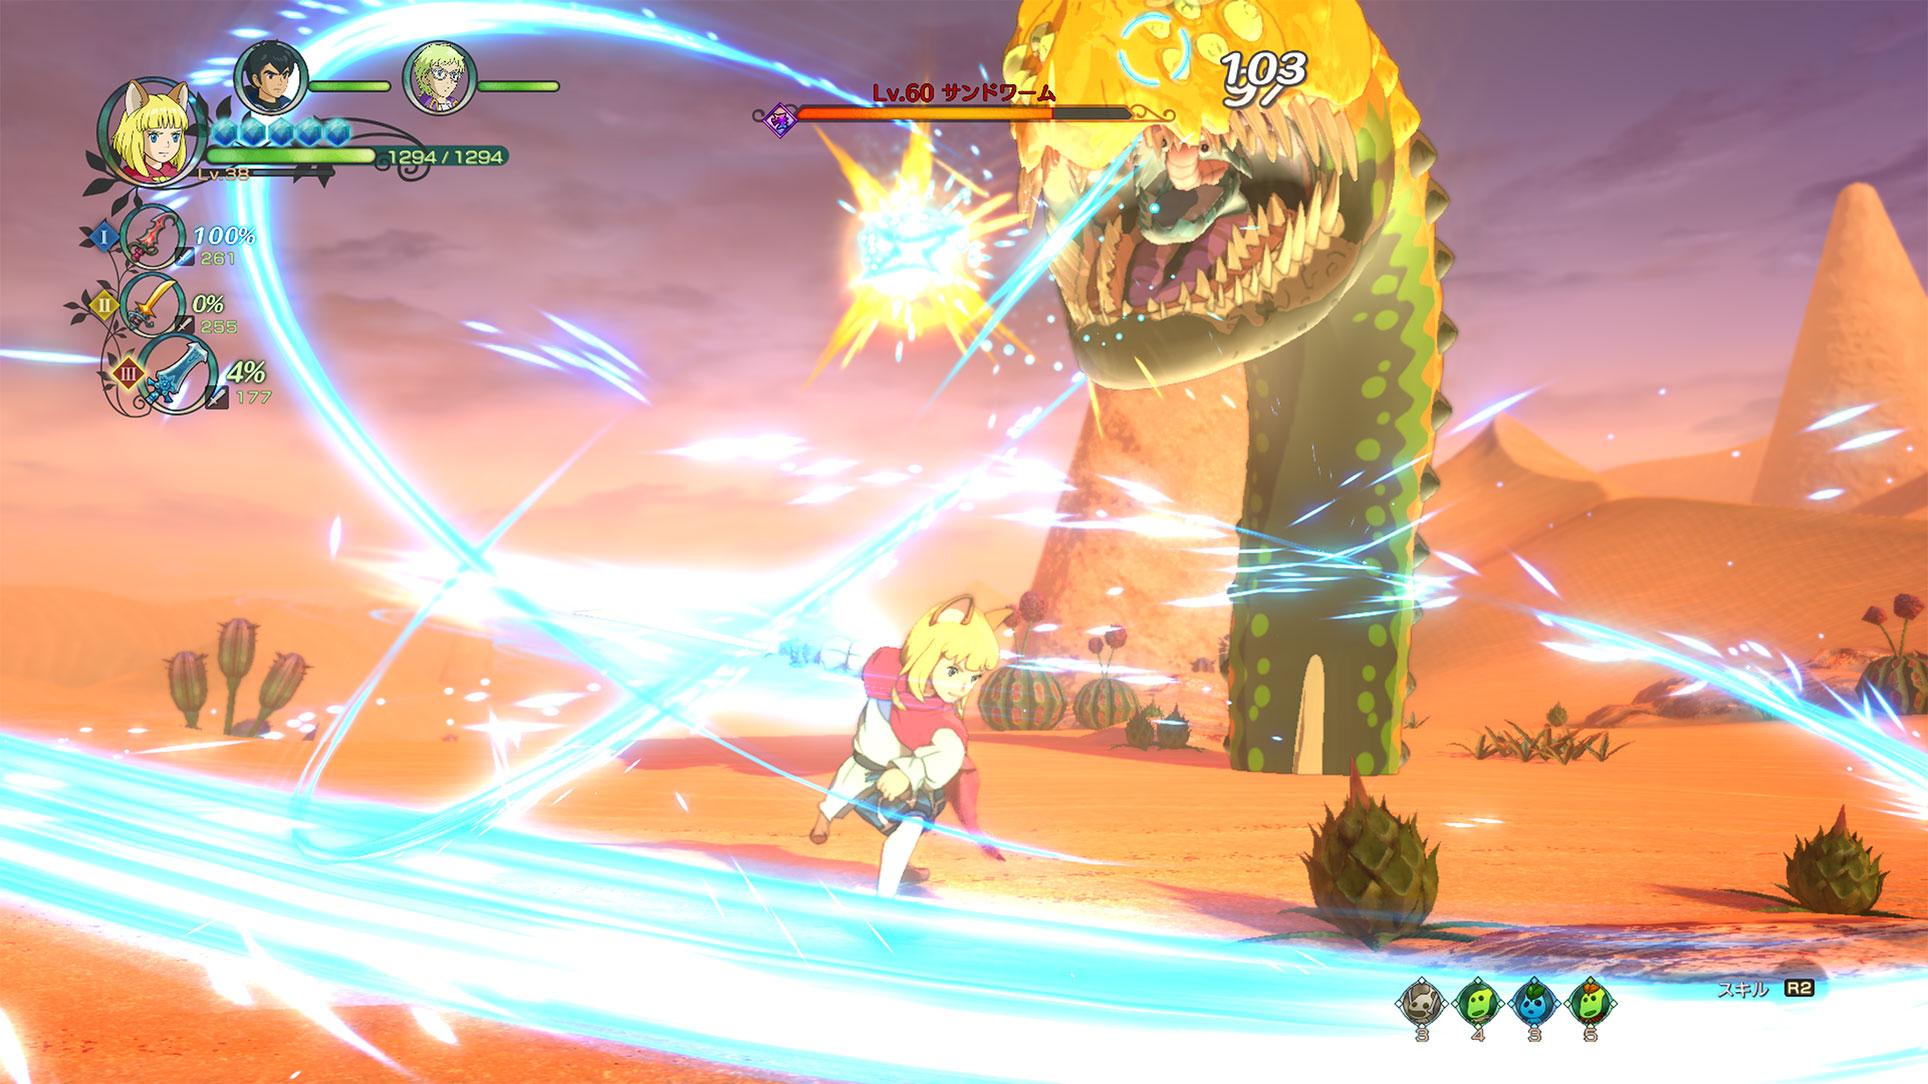 Kämpfe gegen besonders große Bestien und Boss-Gegner ...